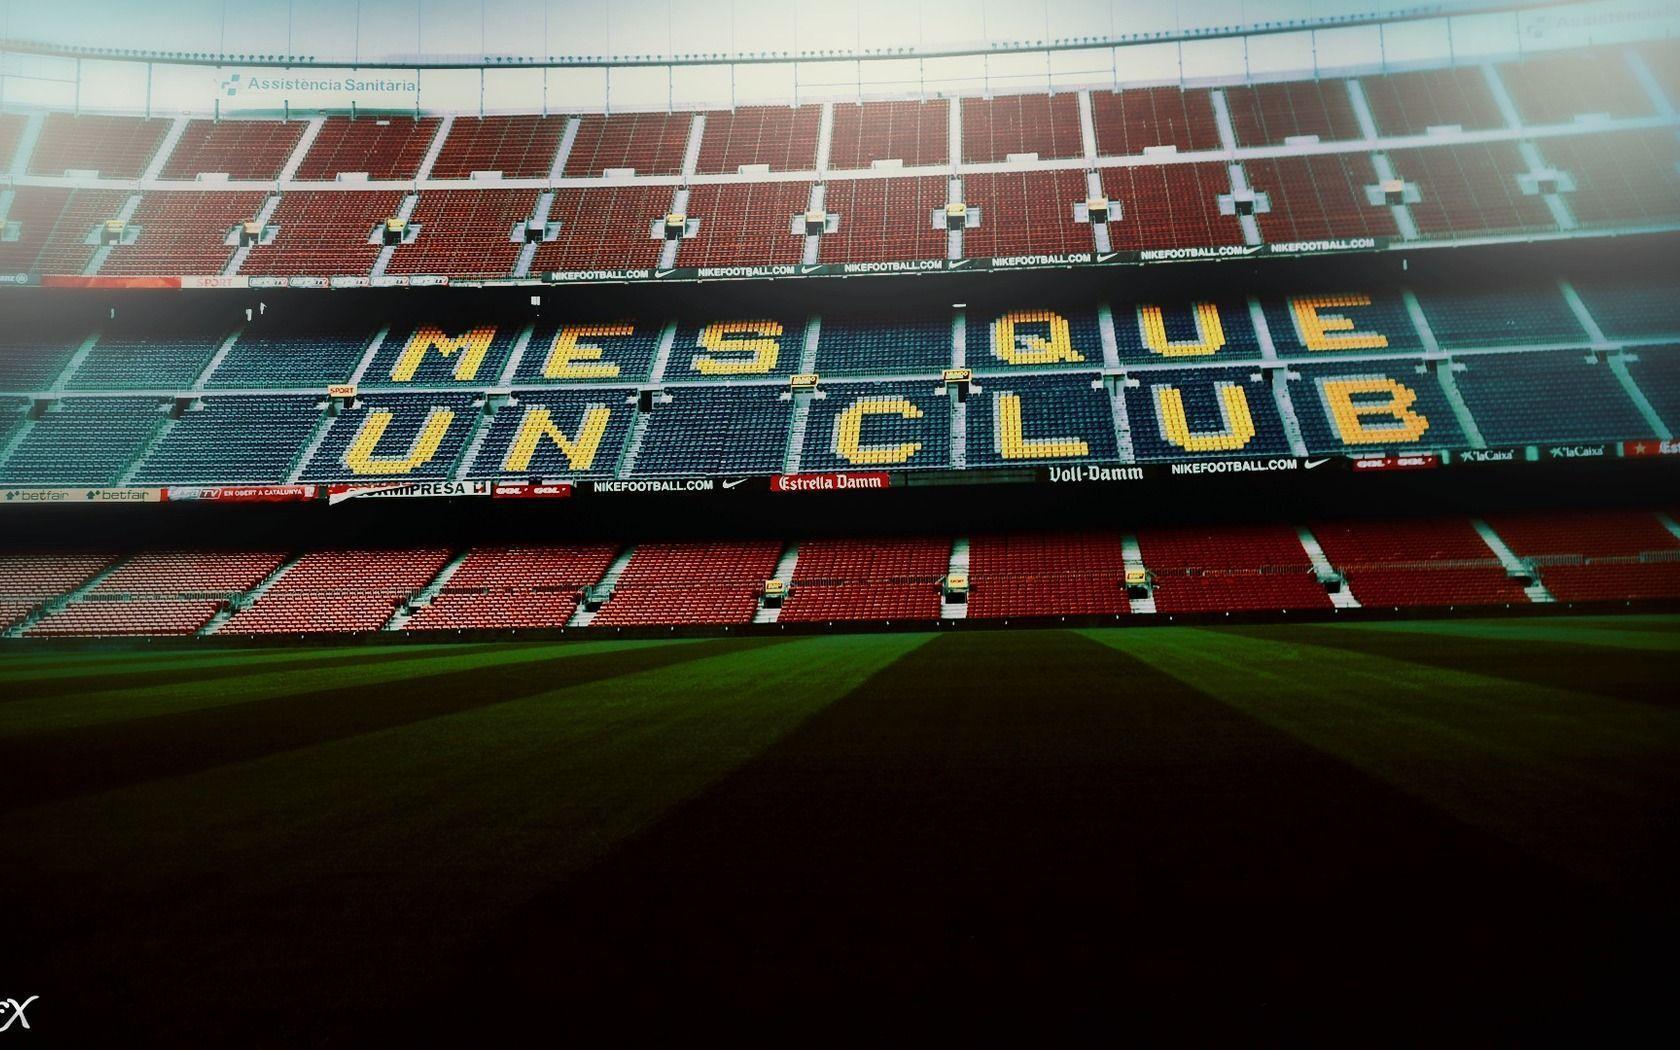 Camp Nou Wallpapers 1680x1050